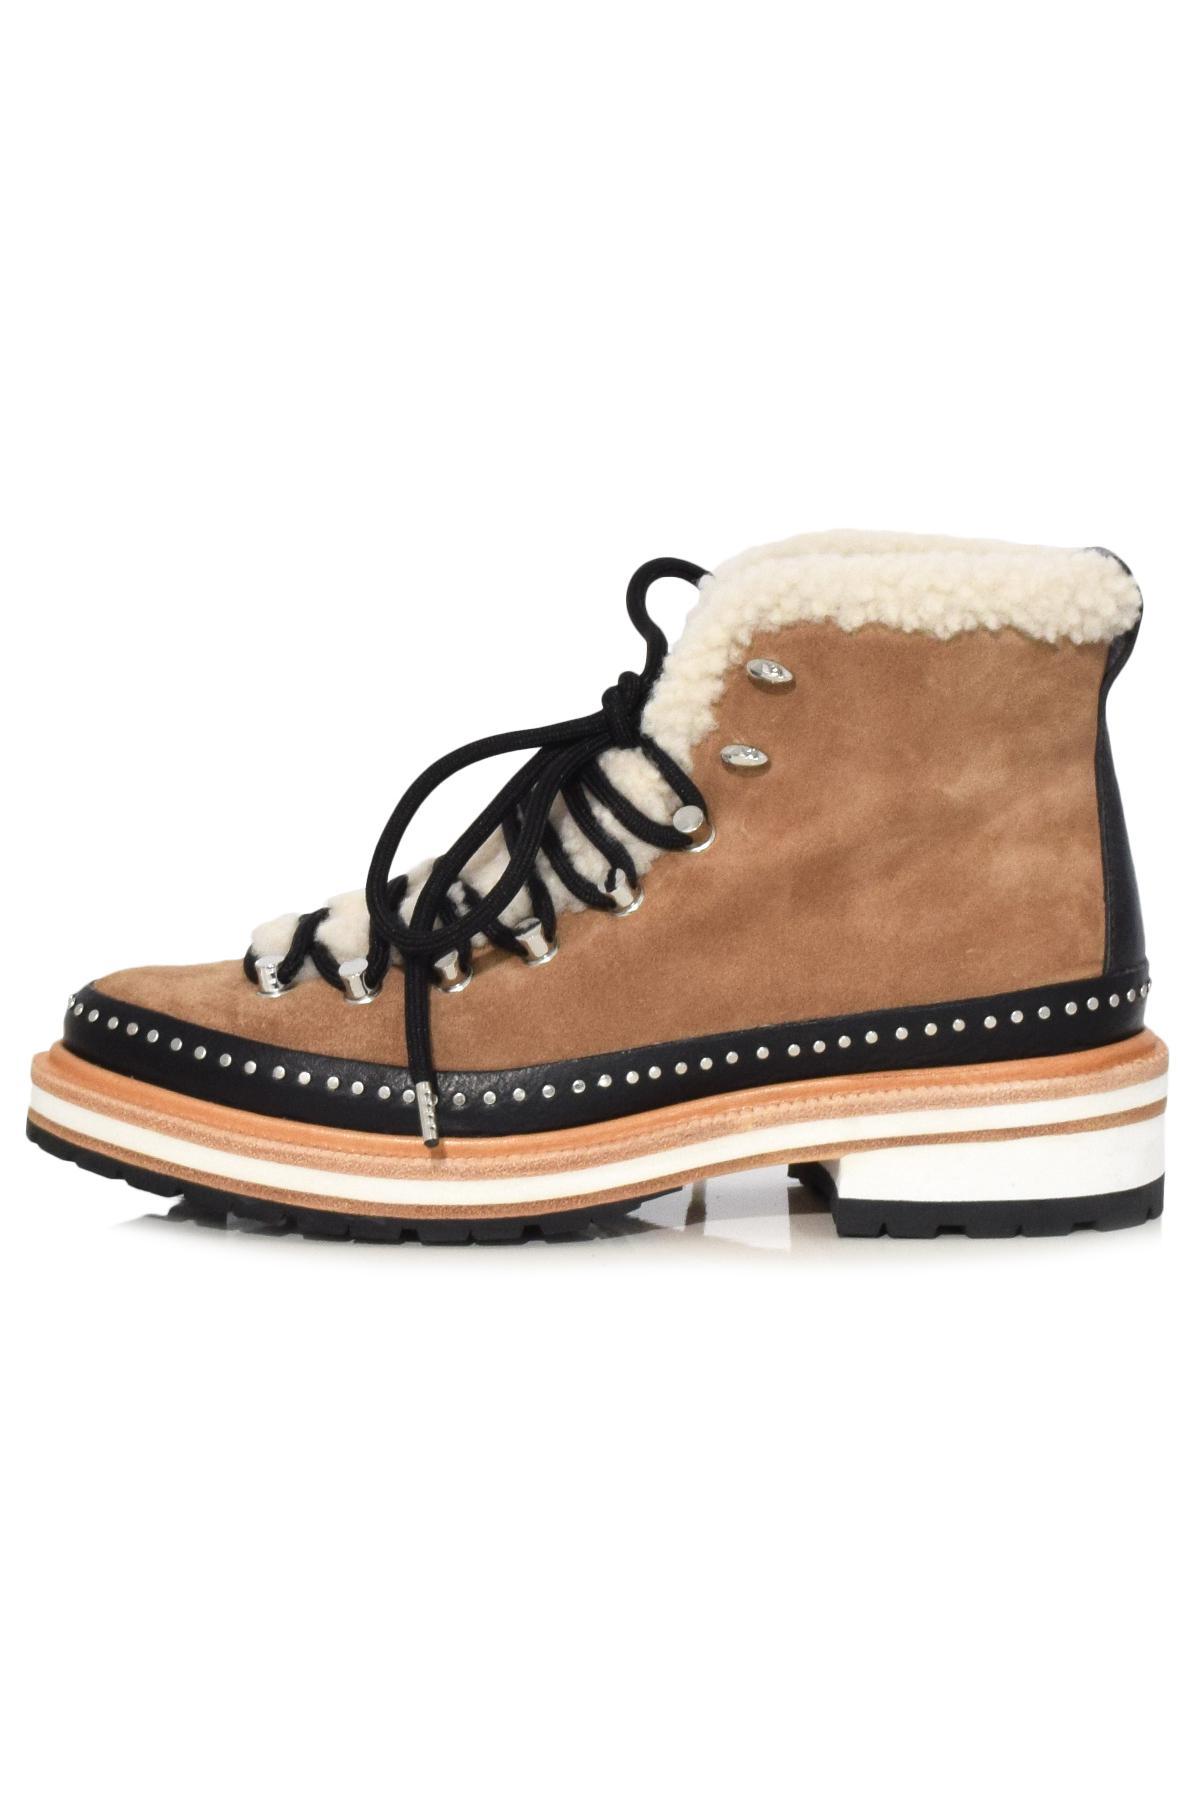 ae3ed544d2e Rag & Bone Compass Boot In Camel/shearling - Lyst